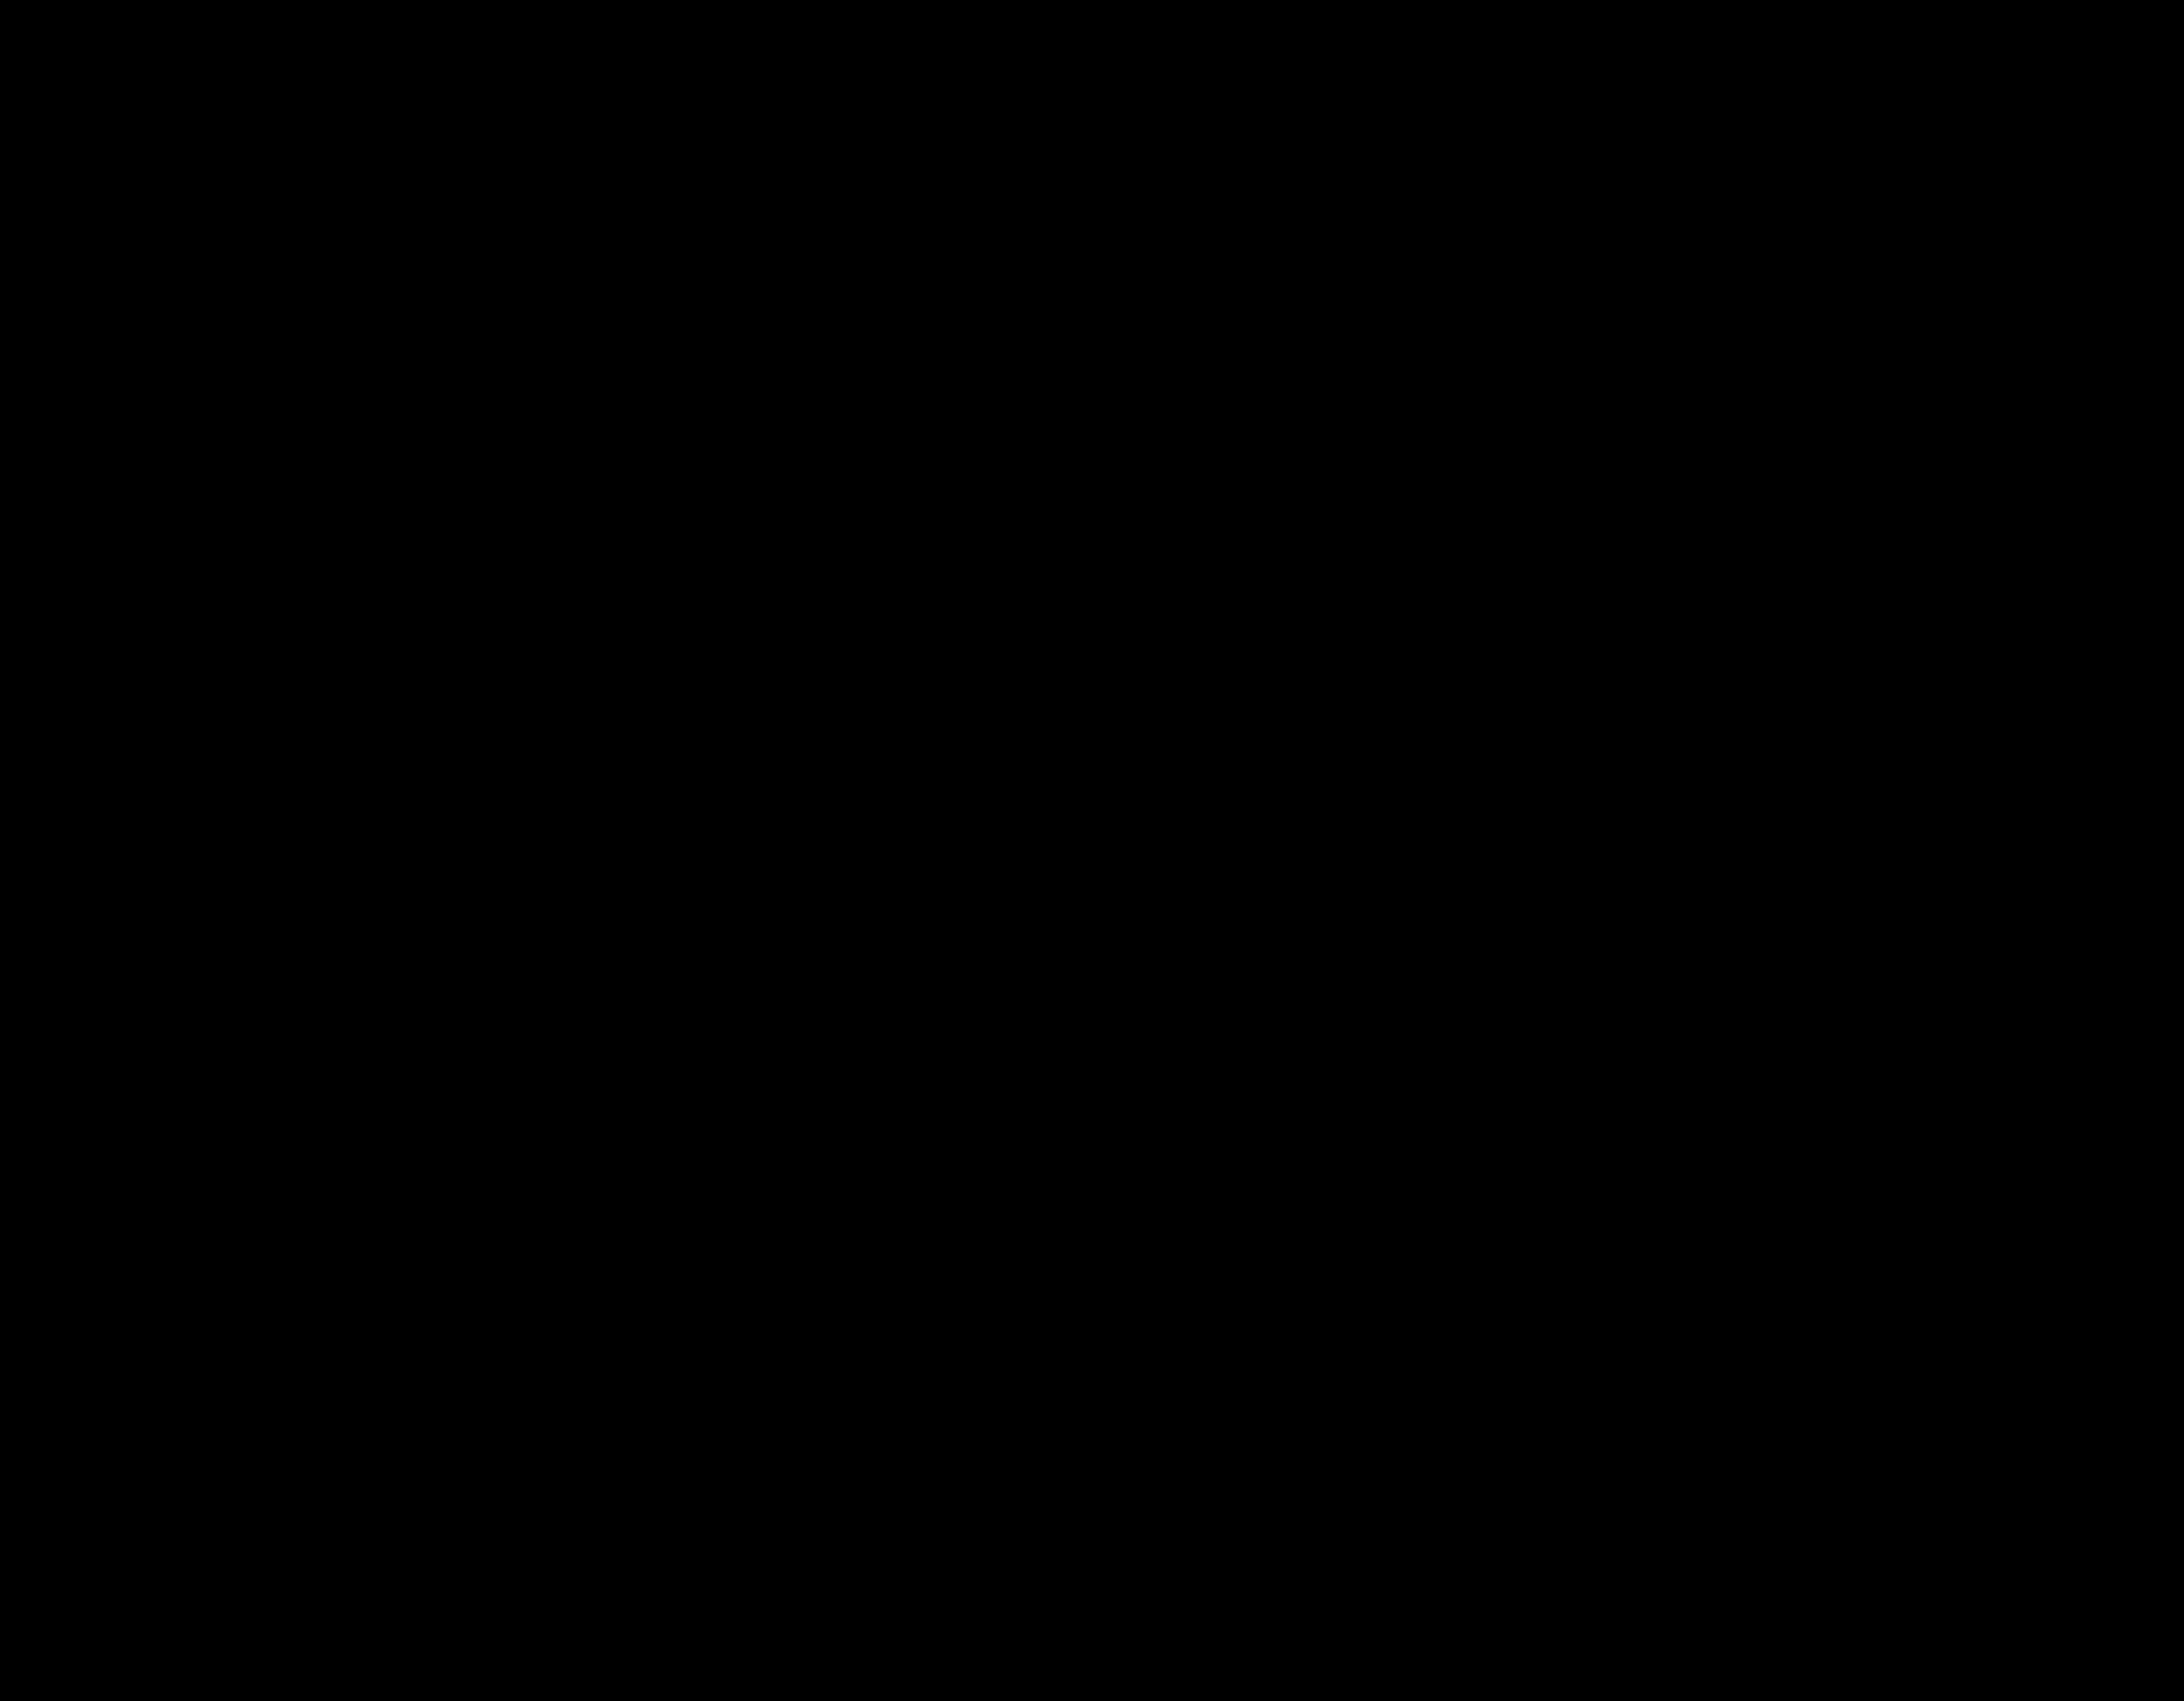 Elements PNG - 24281